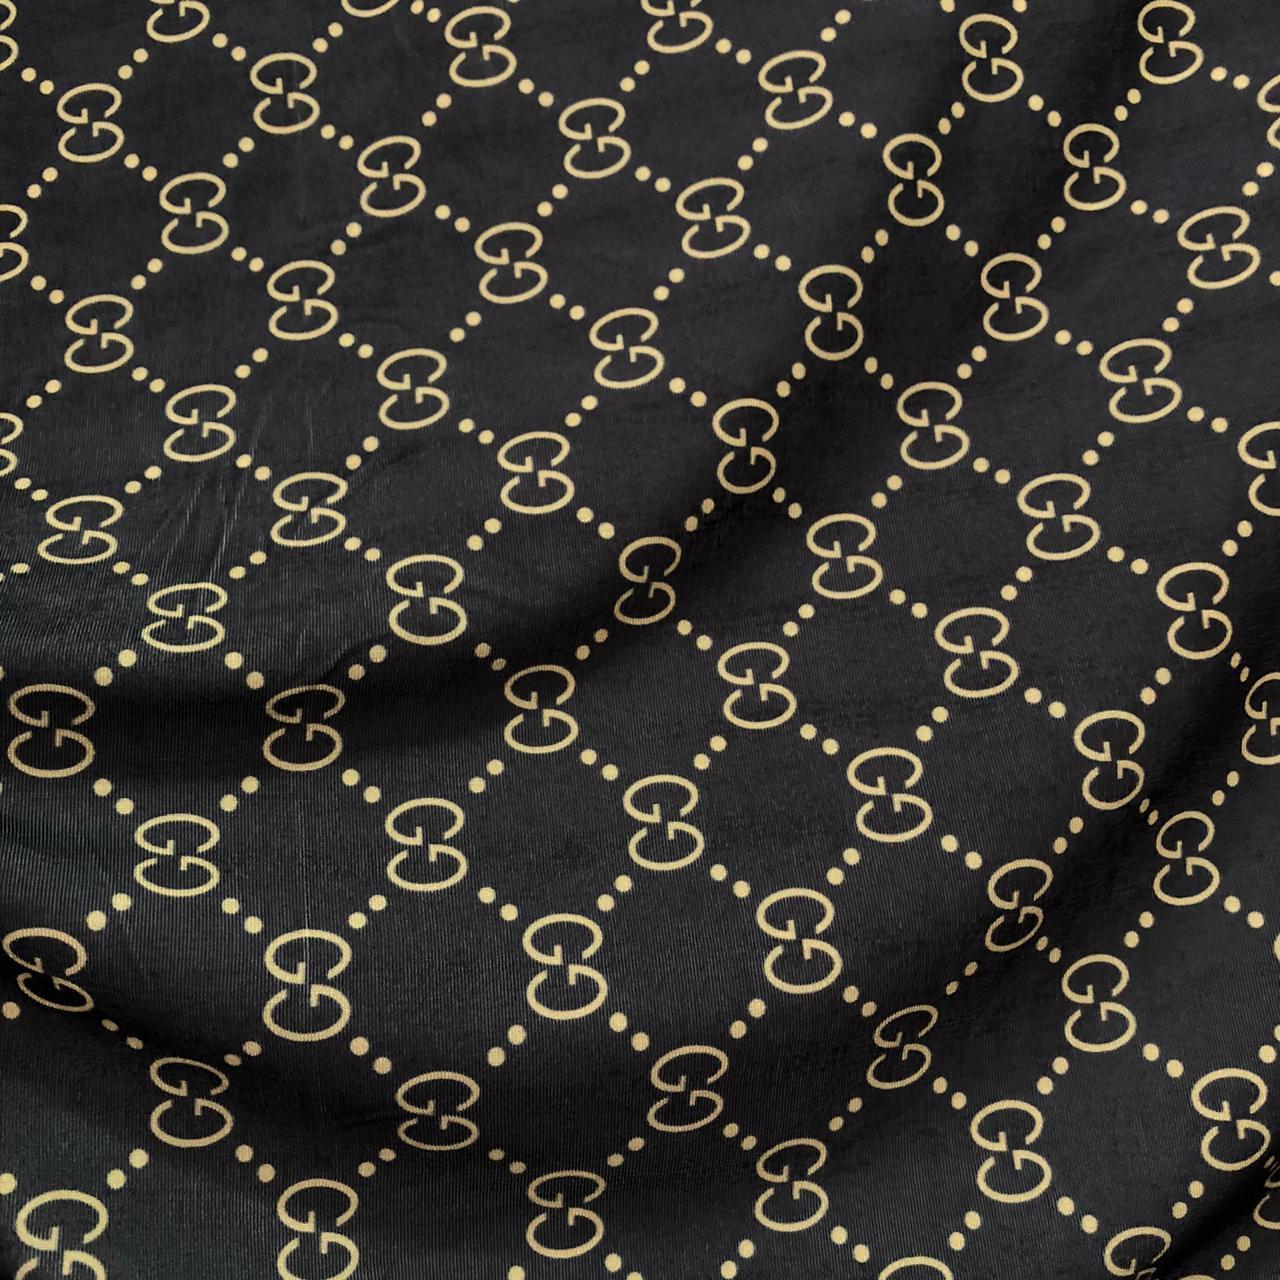 Tecido Malha Slinky Estampado 92%Poliéster 8%Elastano Gucci 2